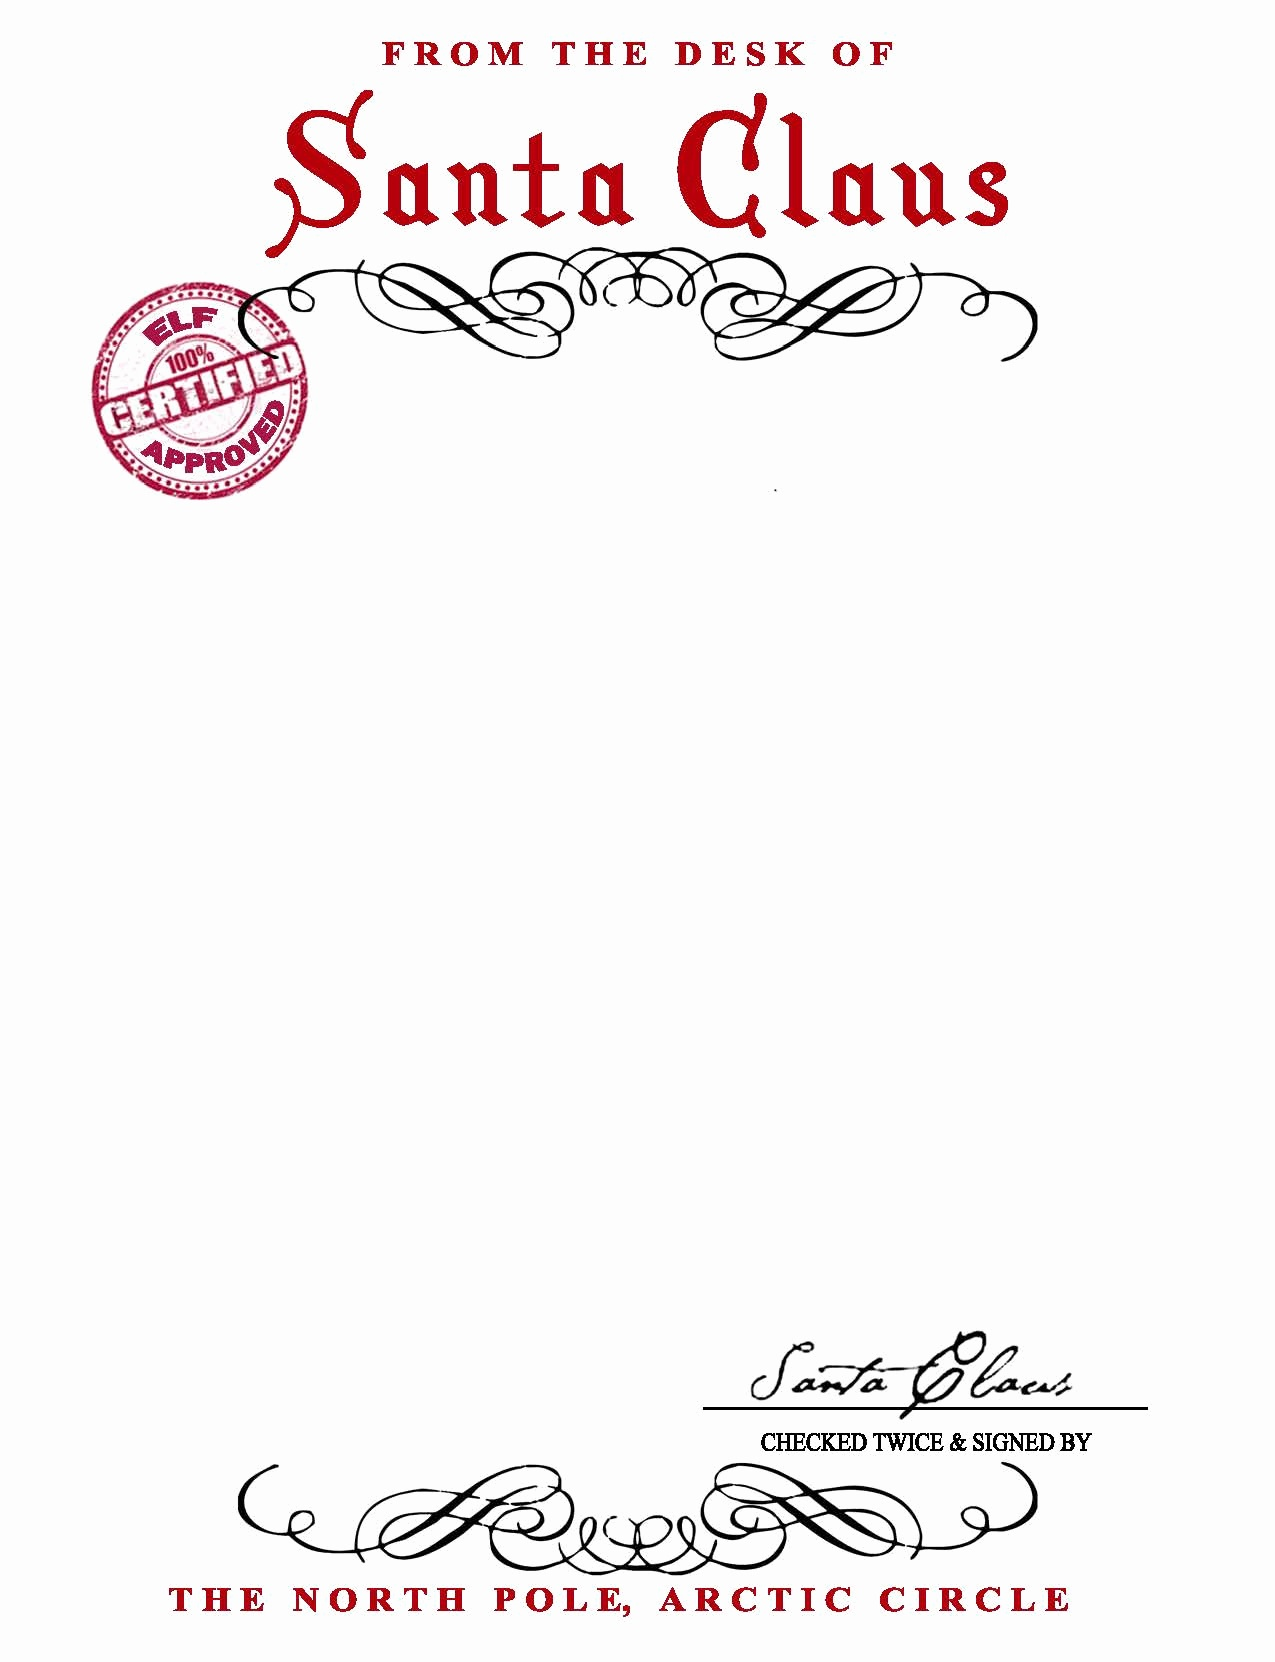 Santa Claus Letterhead Template Free 7 Best Images Of Printable - Free Santa Templates Printable